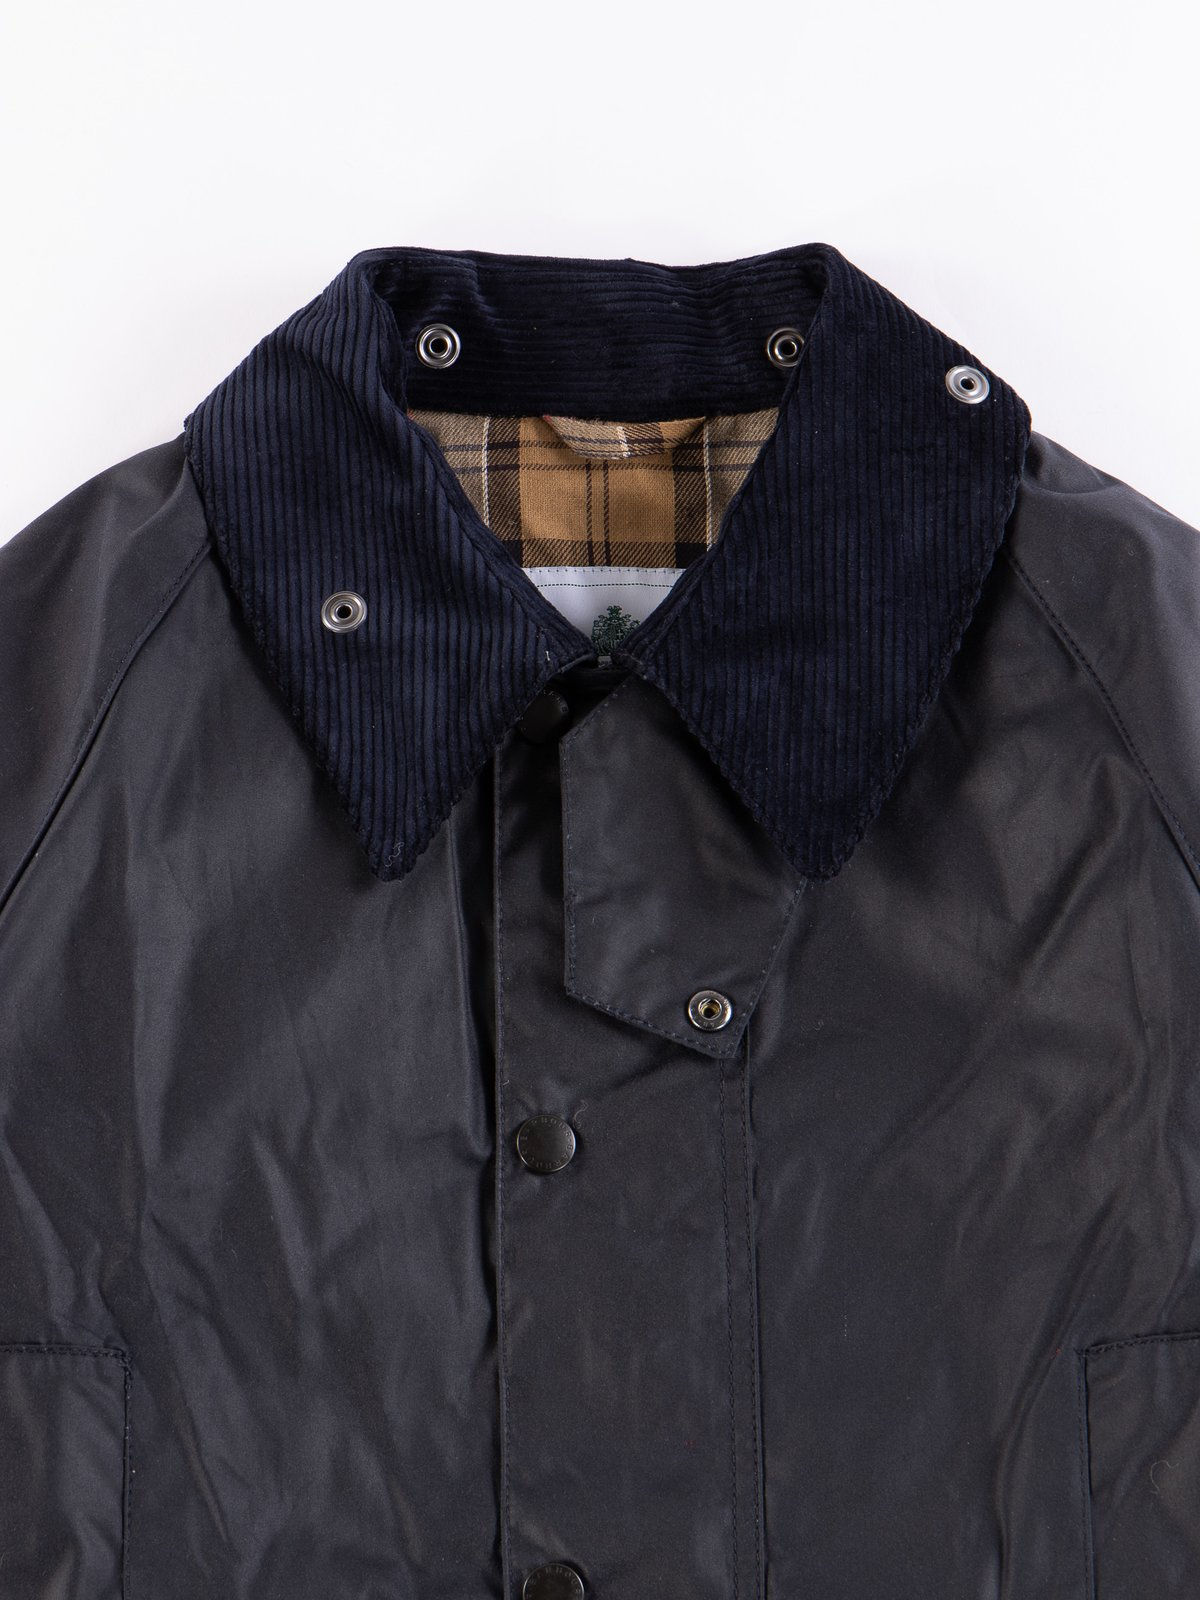 Navy Oversized Beaufort Waxed Cotton Jacket - Image 2